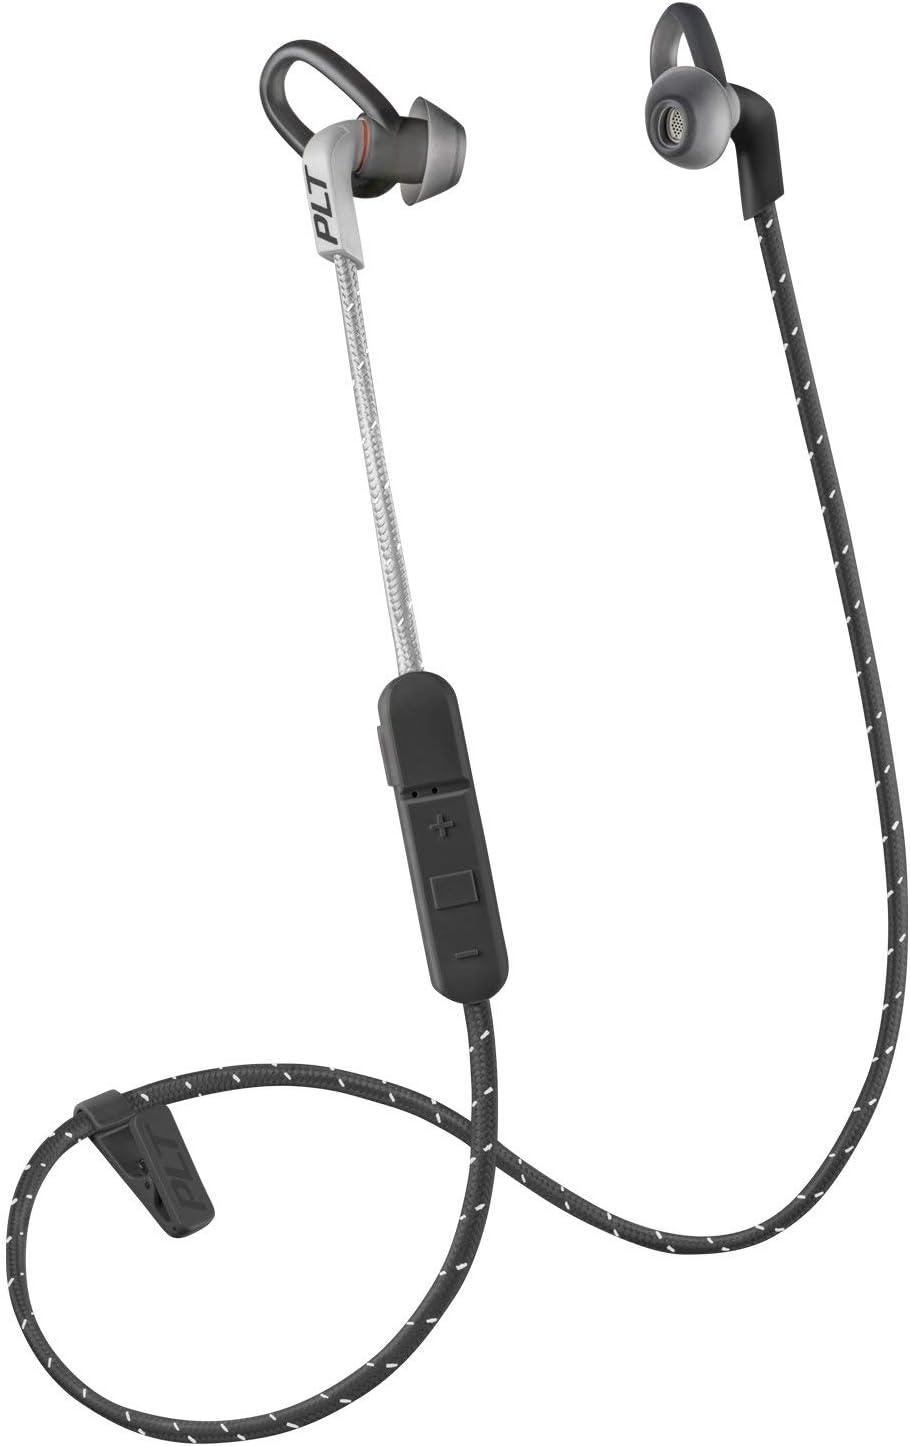 Plantronics BackBeat FIT 300 Sweatproof Sport Earbuds, Wireless Headphones, Black/Grey (Renewed)